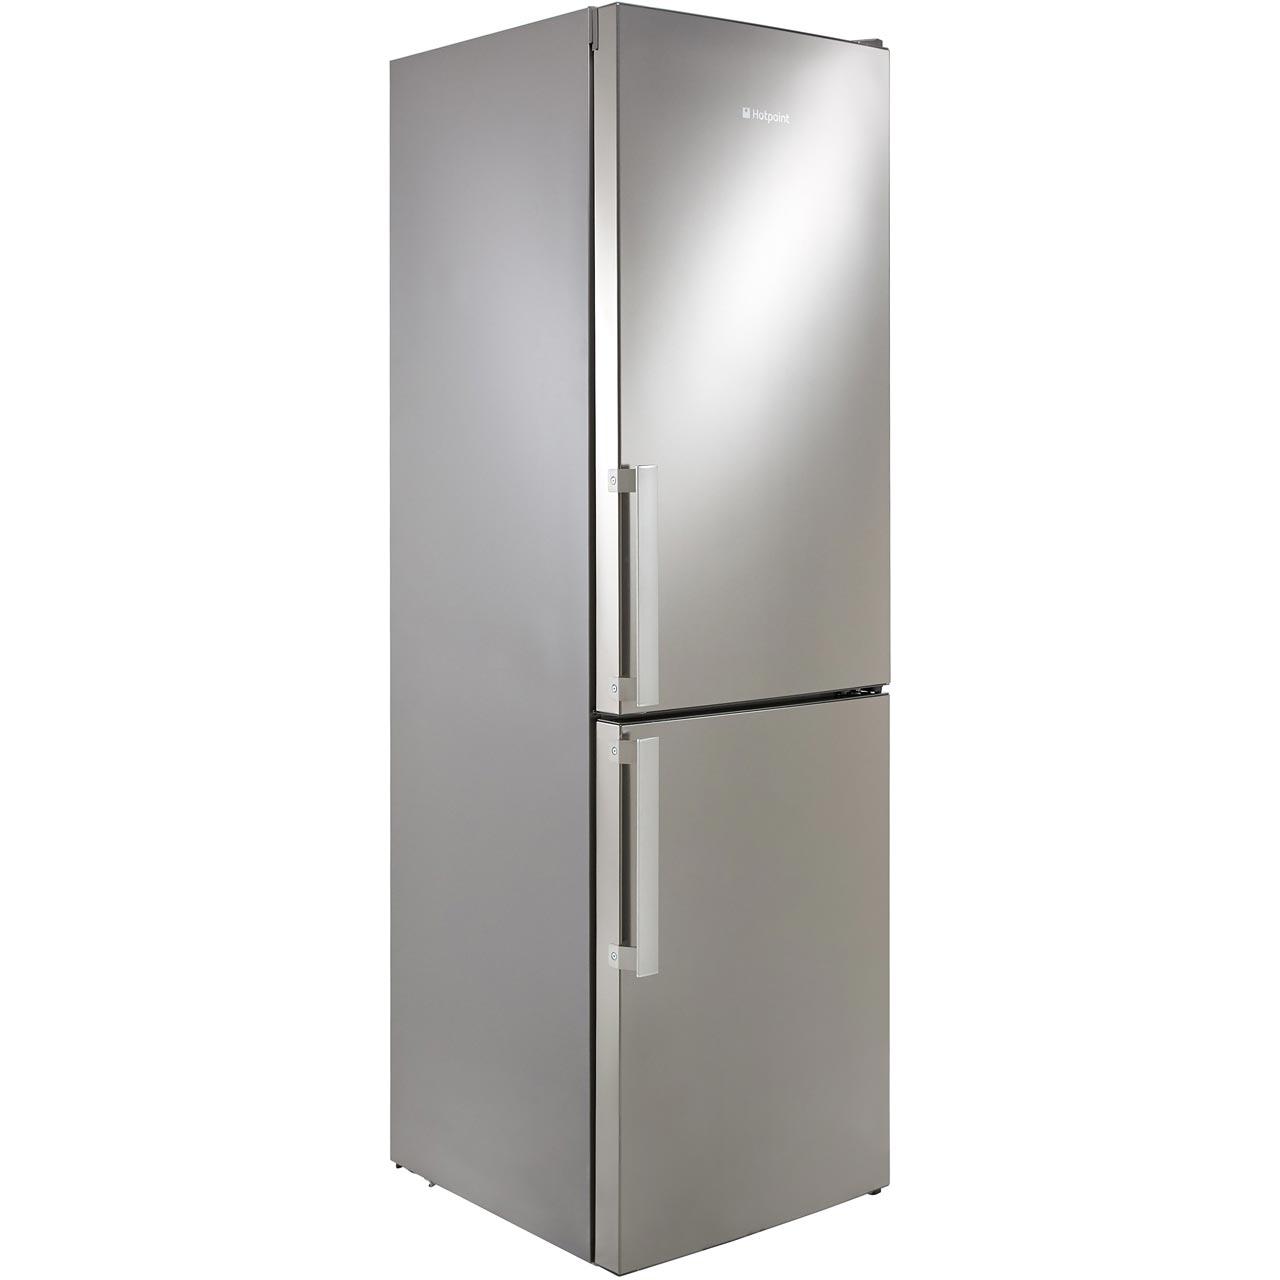 Hotpoint H5t811imxh Fridge Freezer Mirror Finish